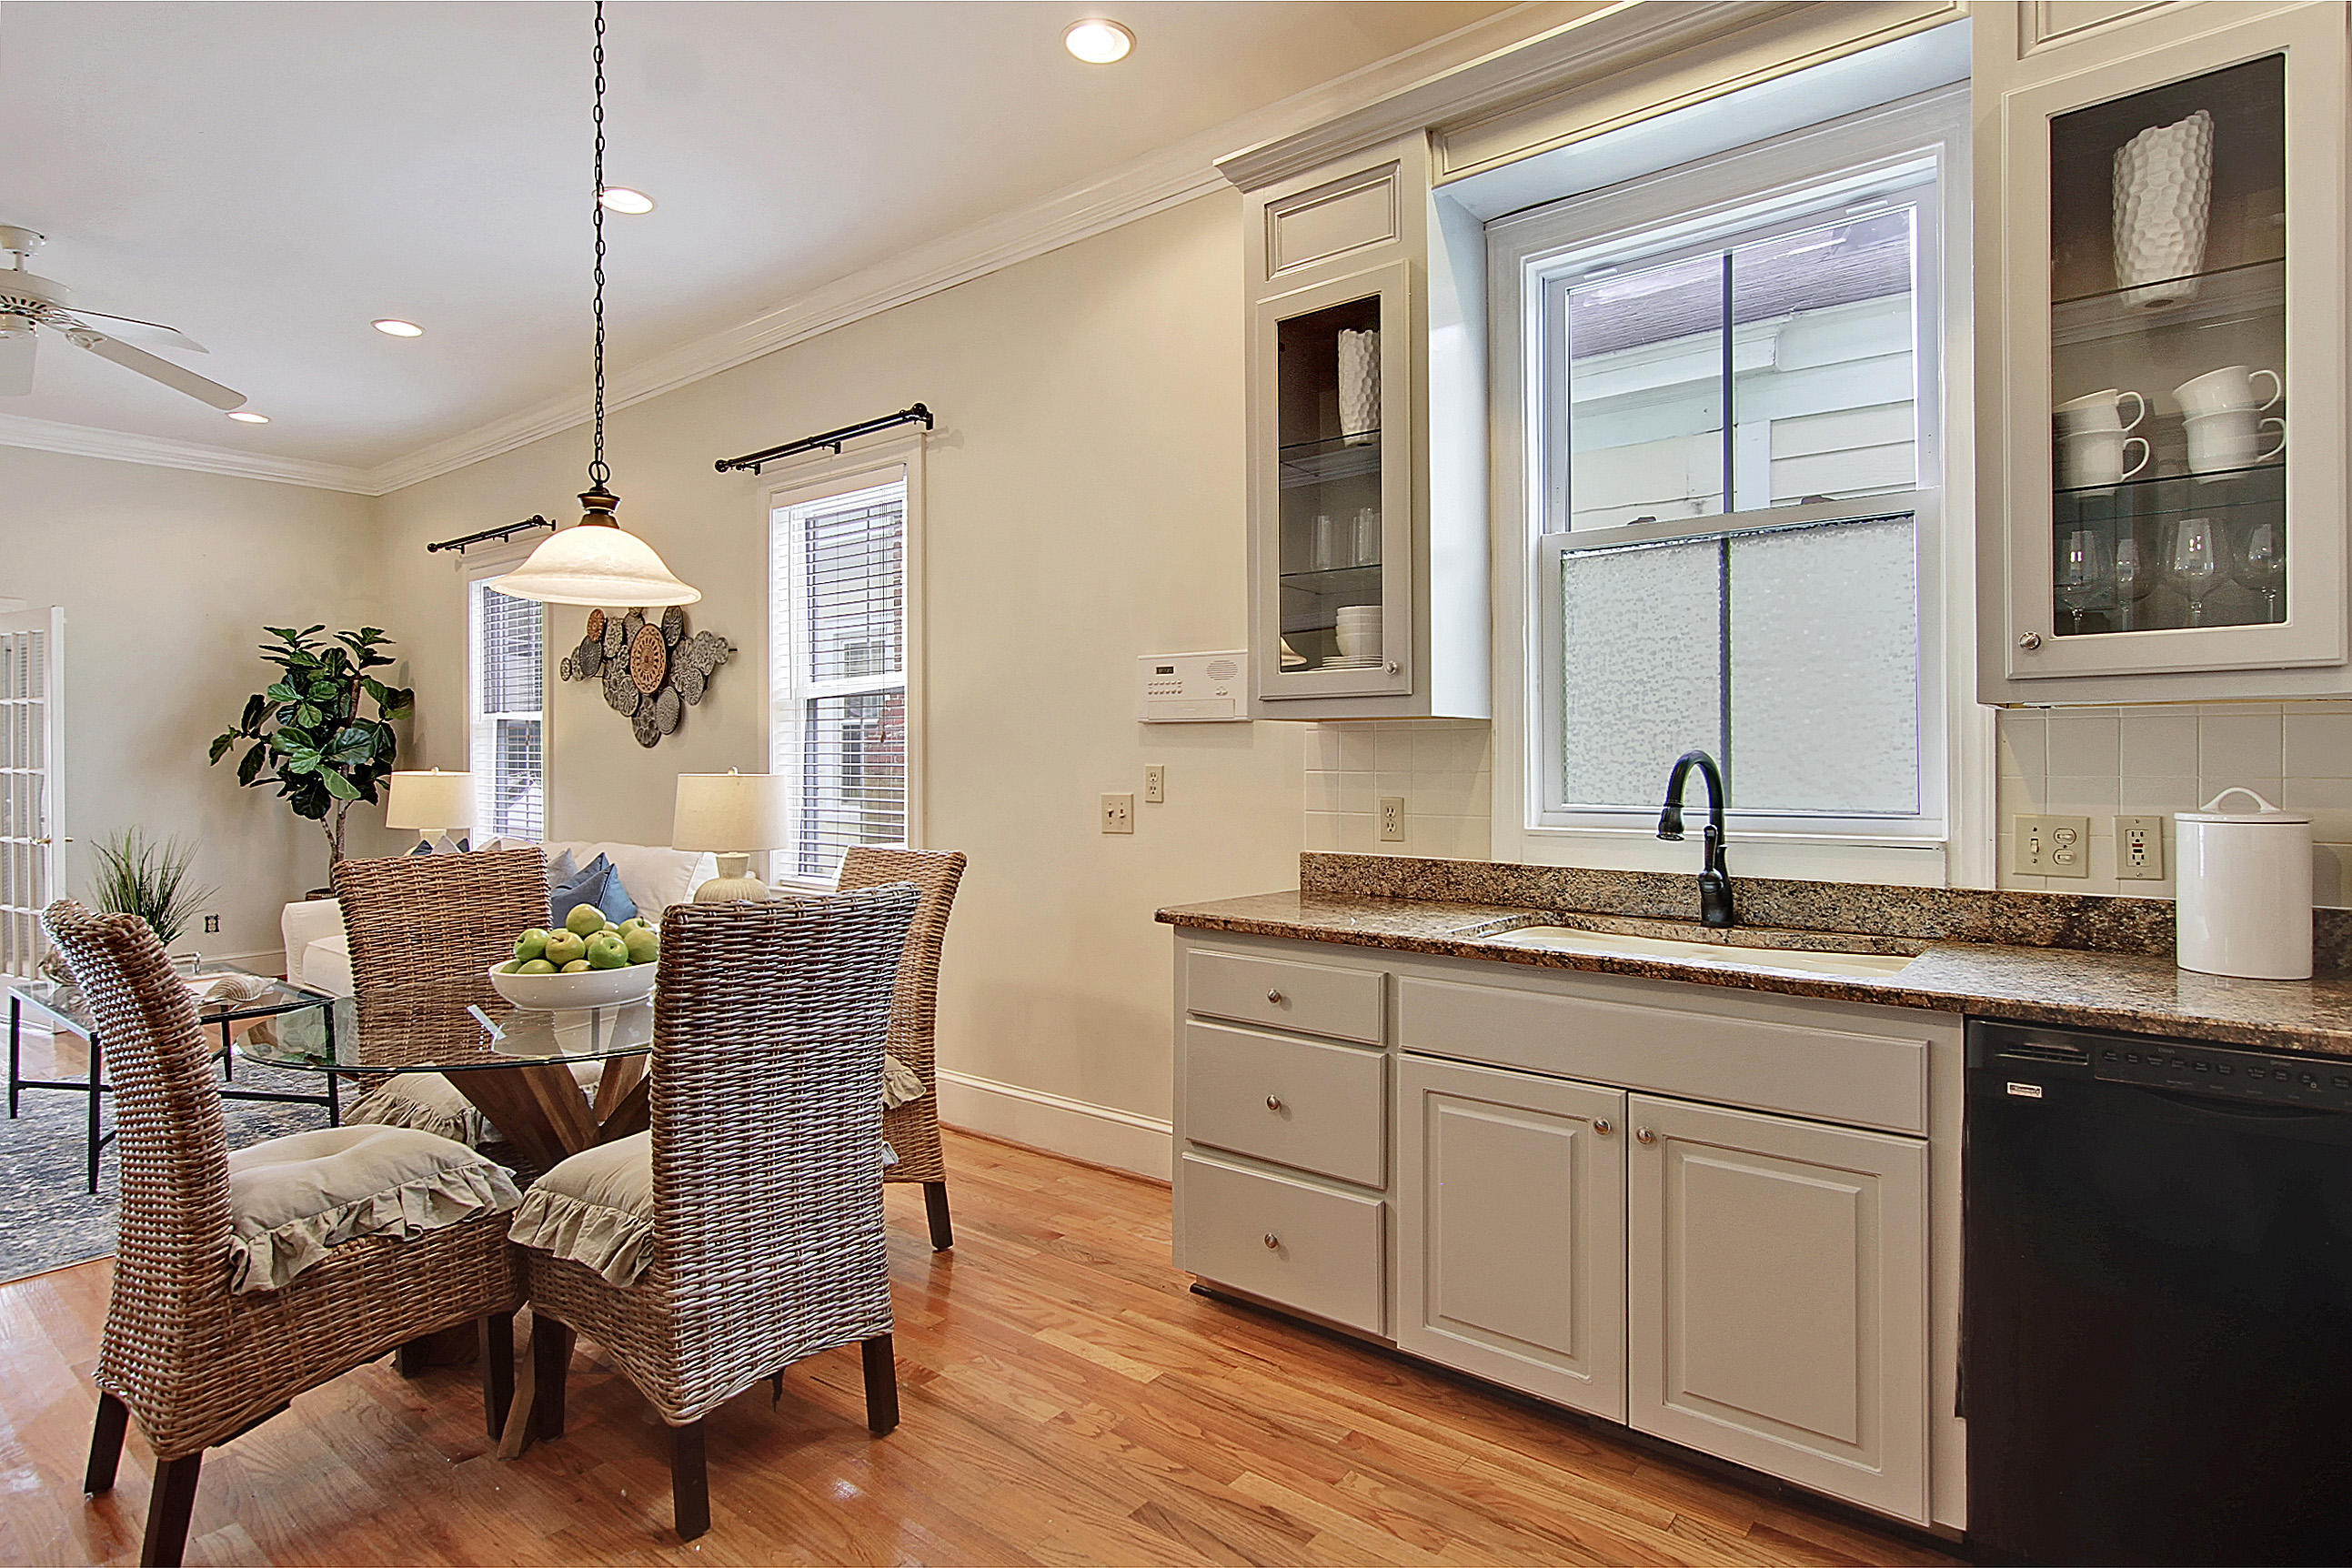 Wagener Terrace Homes For Sale - 136 Darlington, Charleston, SC - 17